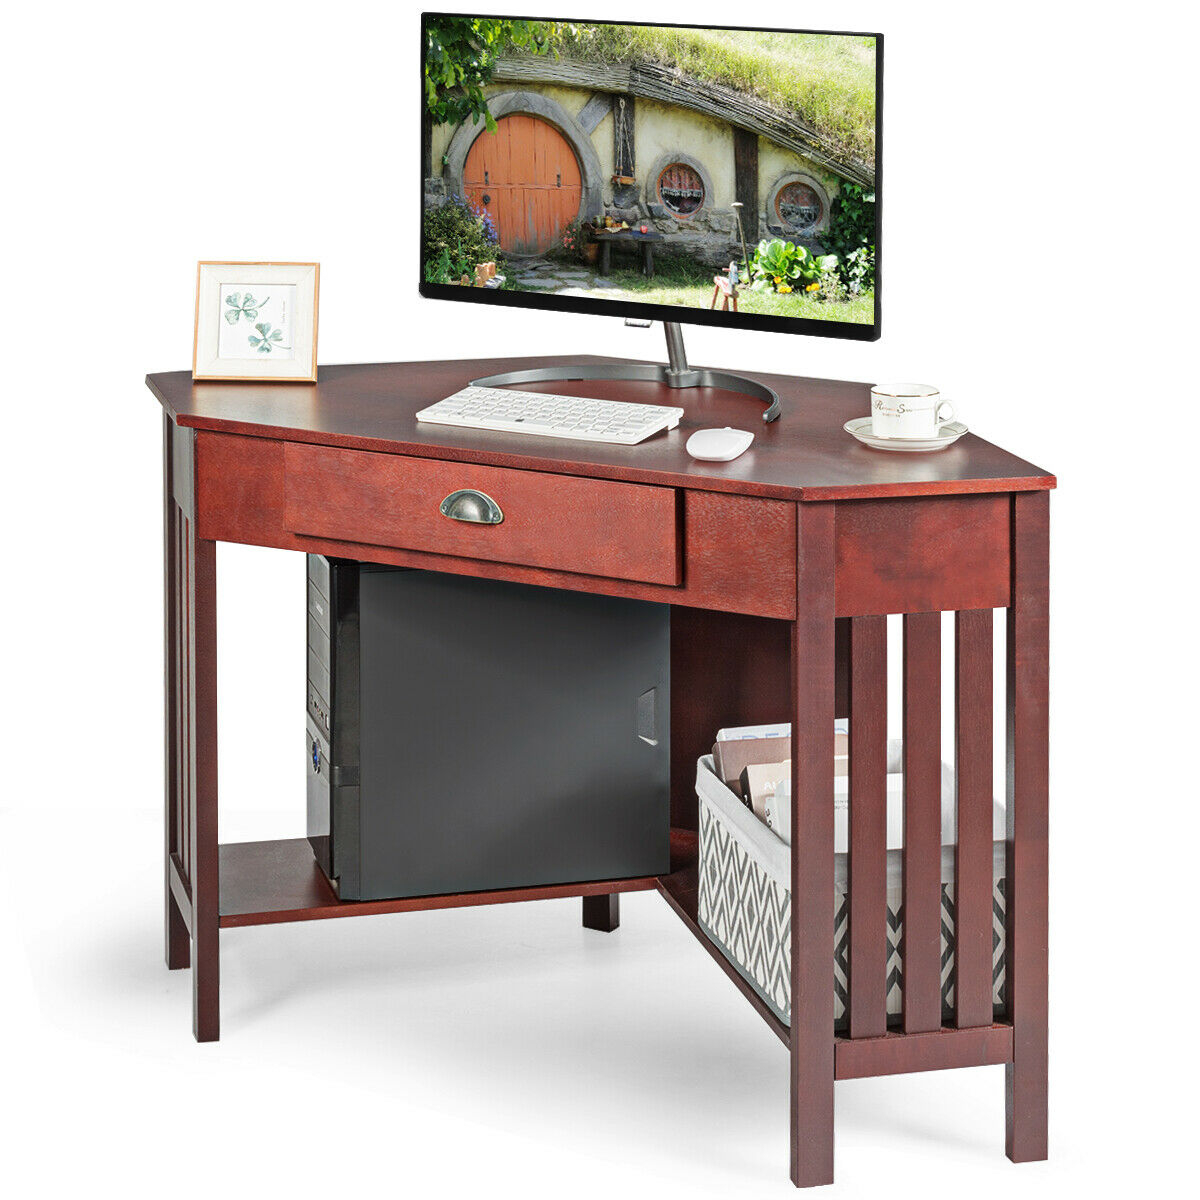 Corner Writing Desk with Drawer & Shelves